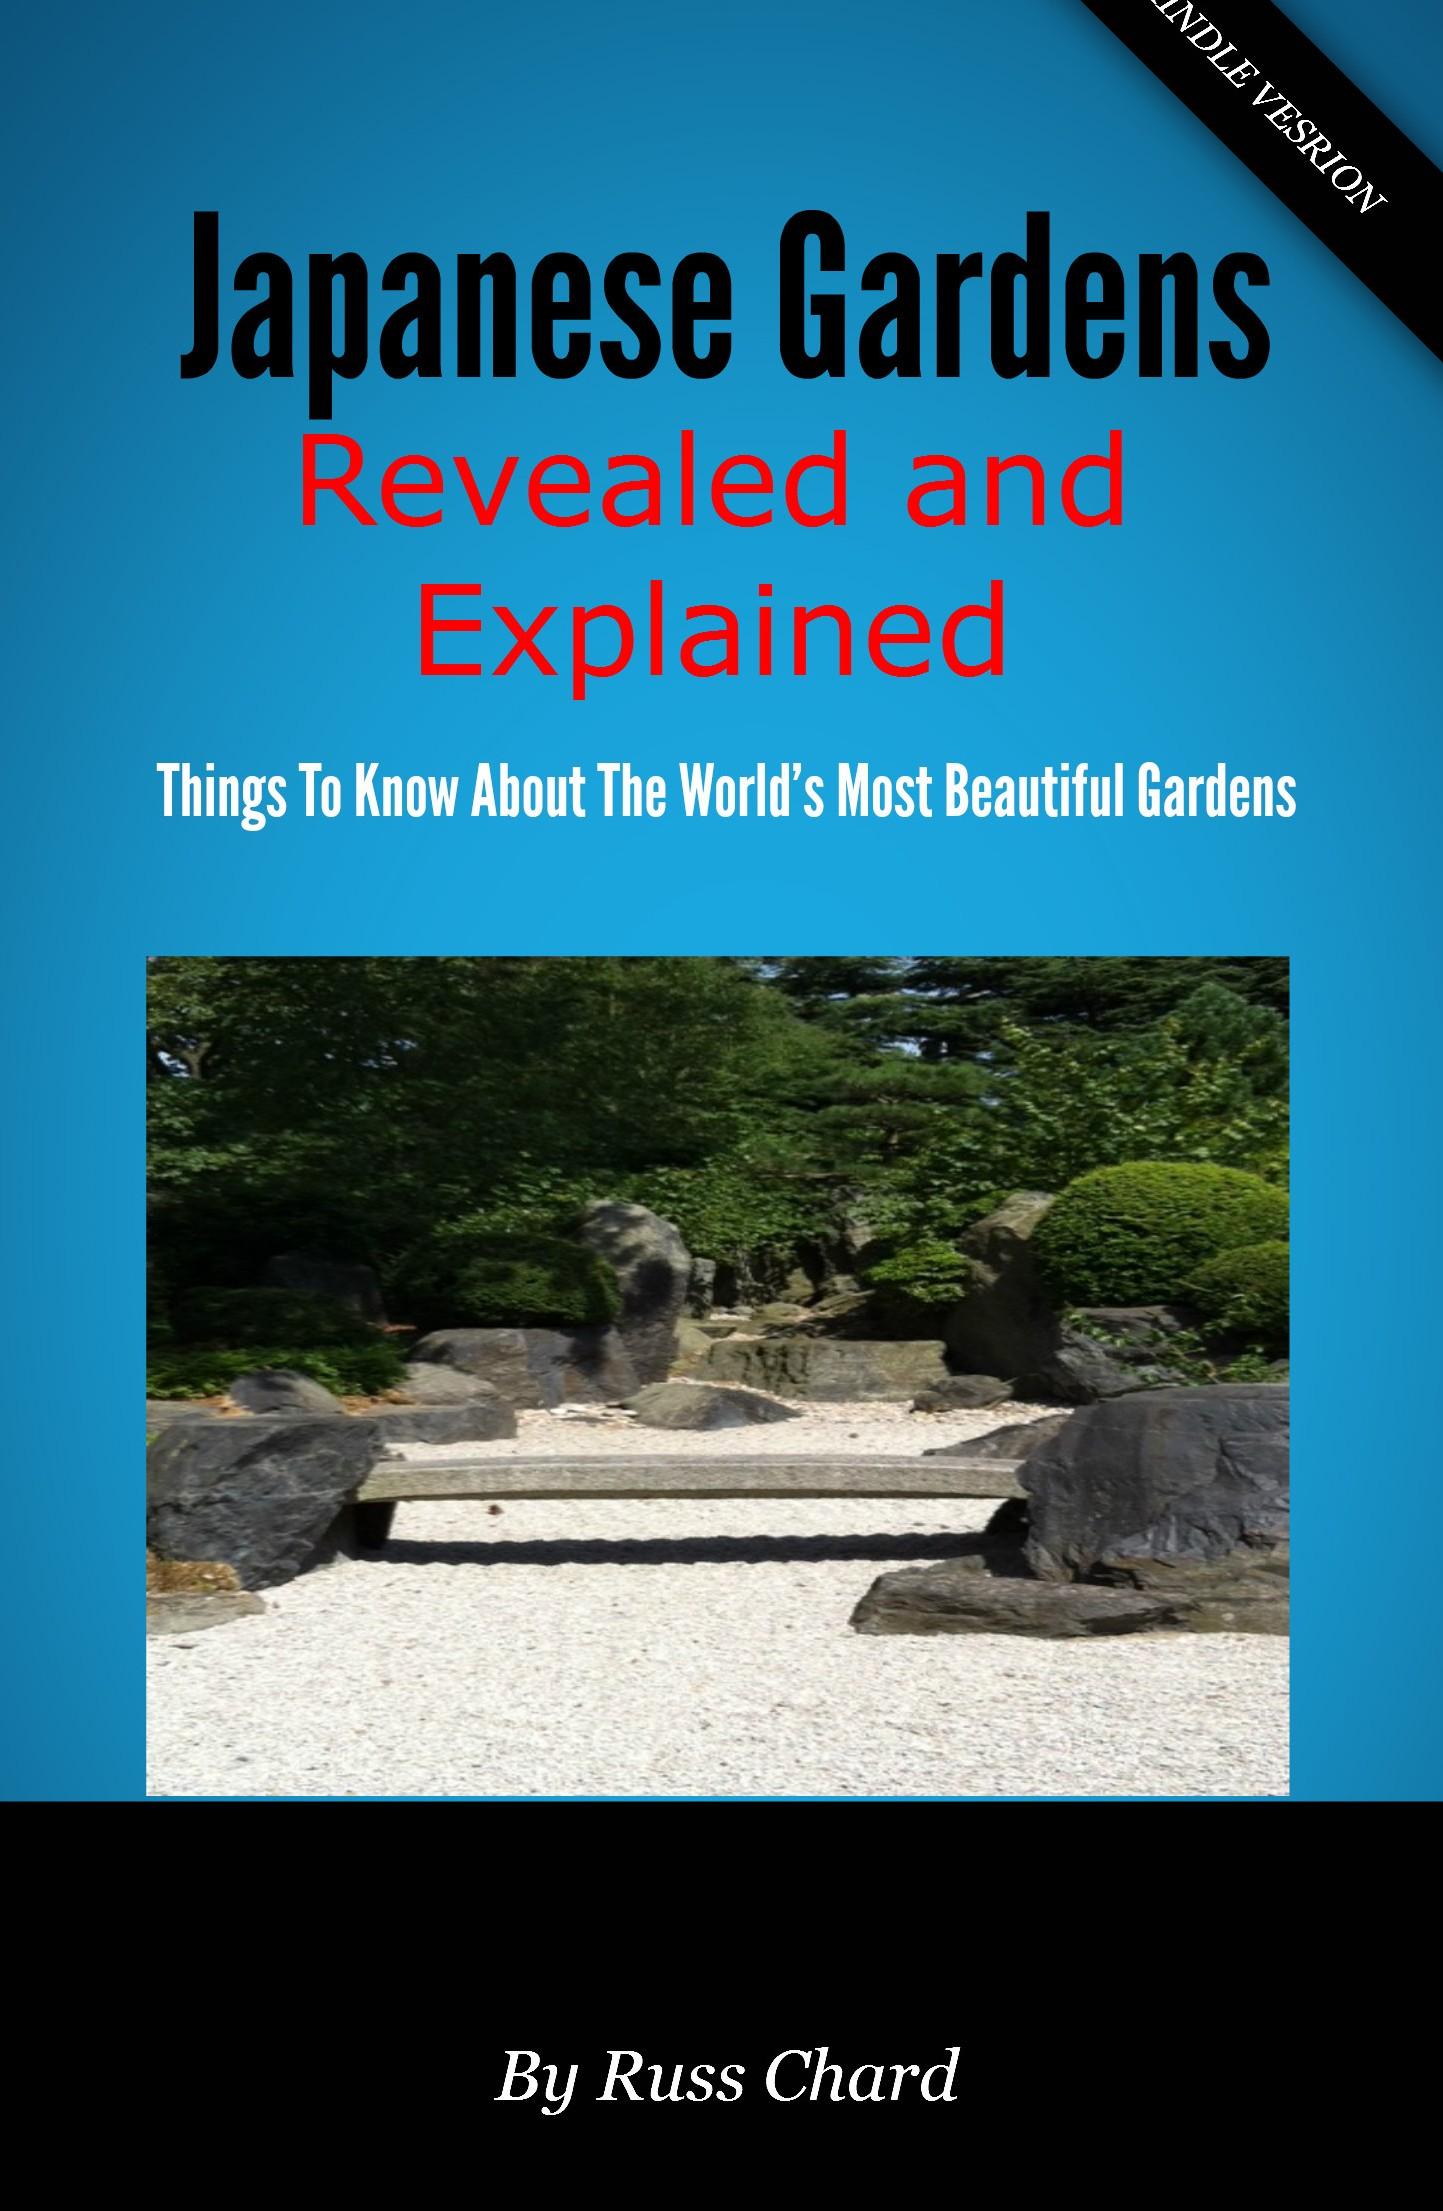 Russ Chard Japanese Gardens Revealed and Explained revealed